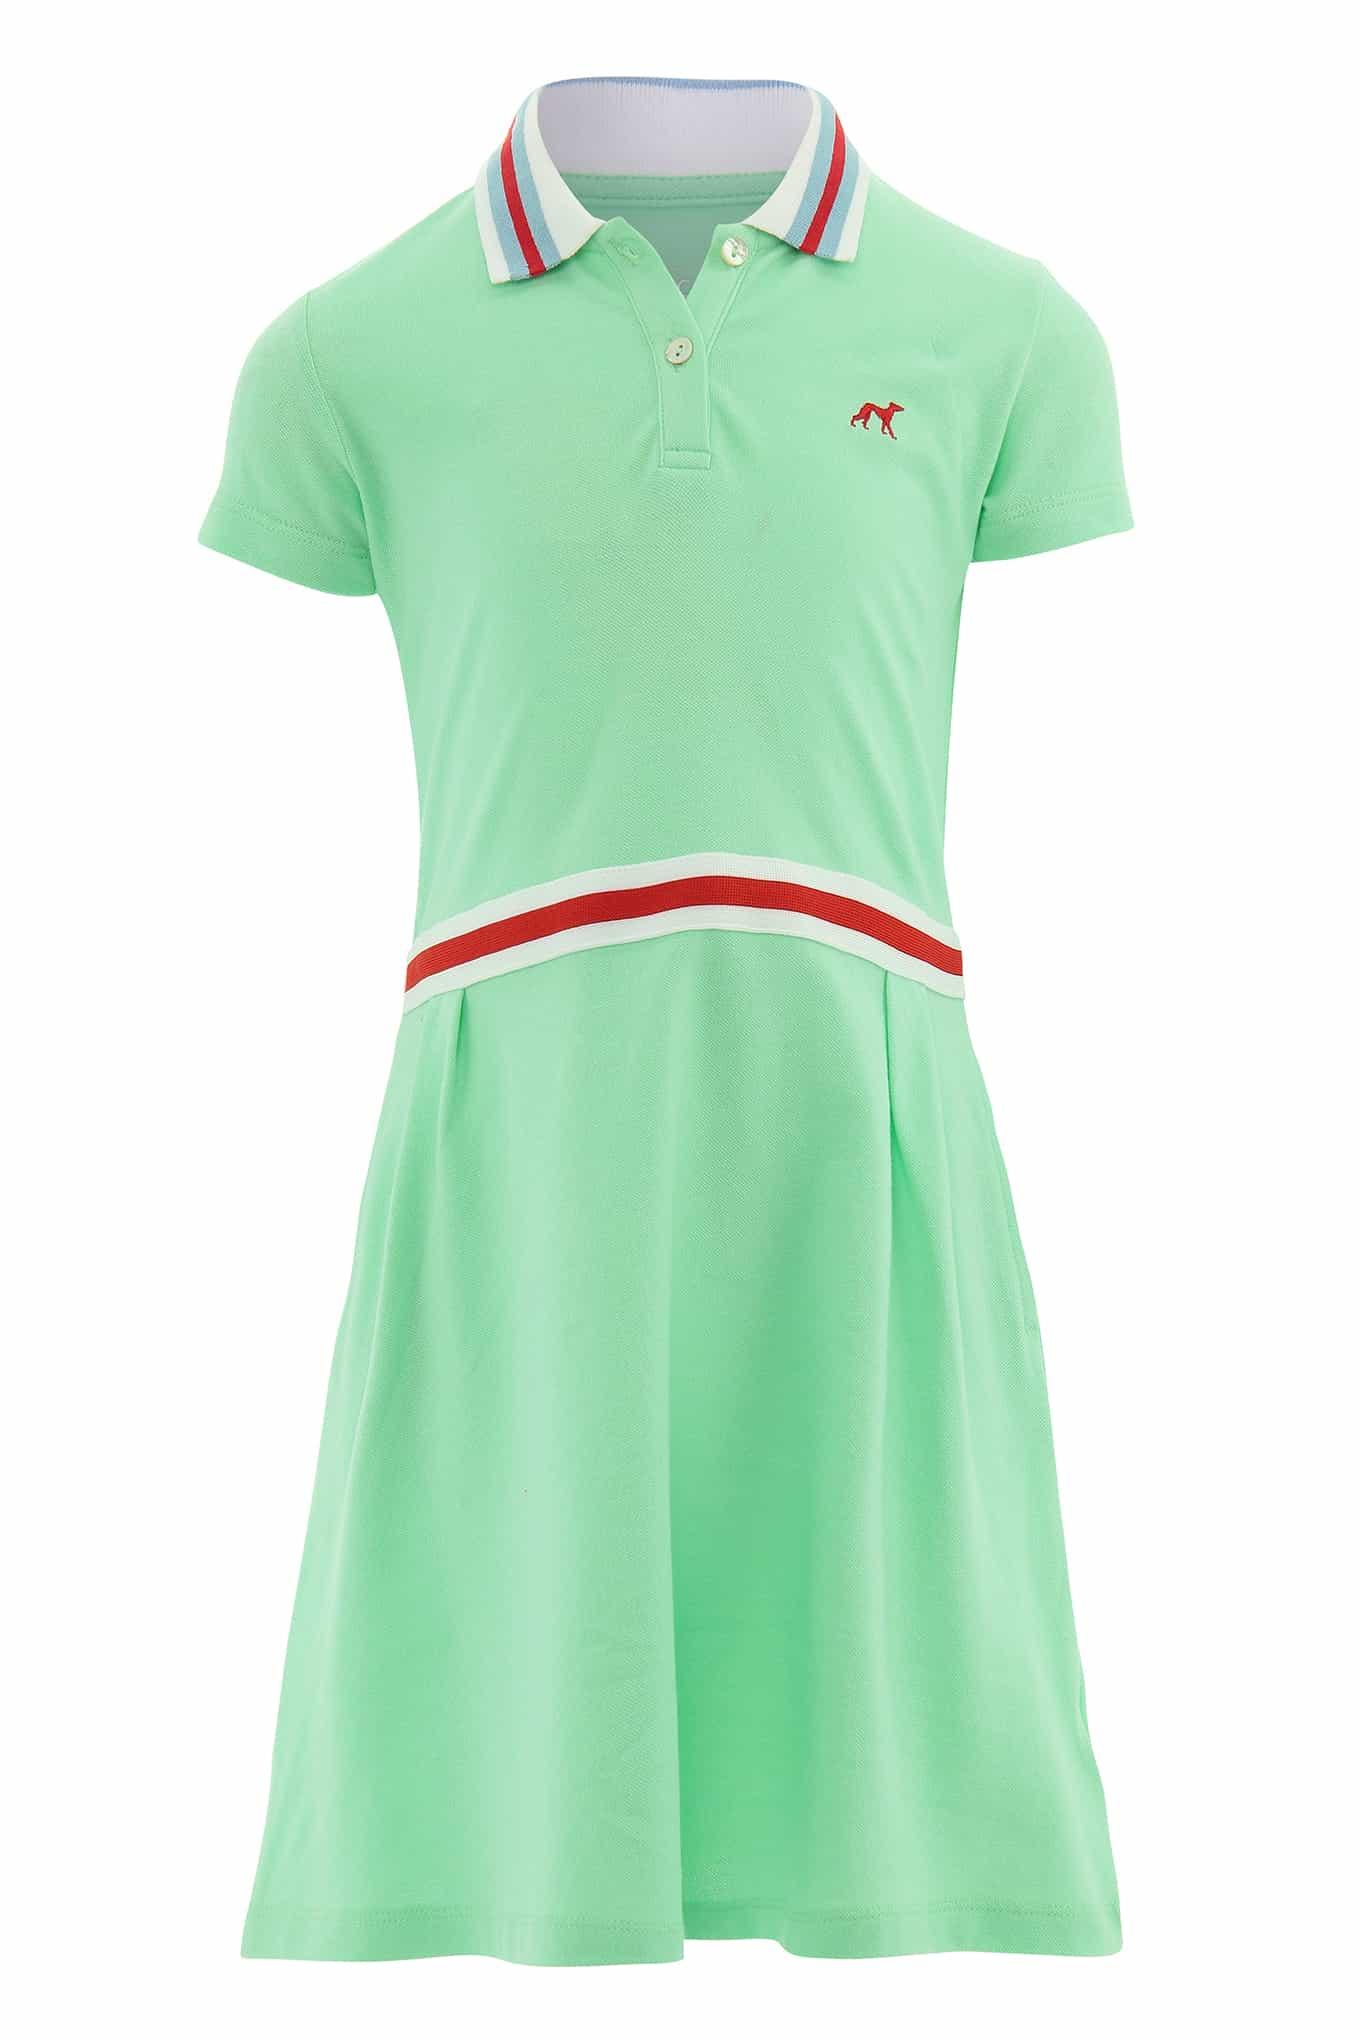 Vestido Piquet Menta Sport Rapariga